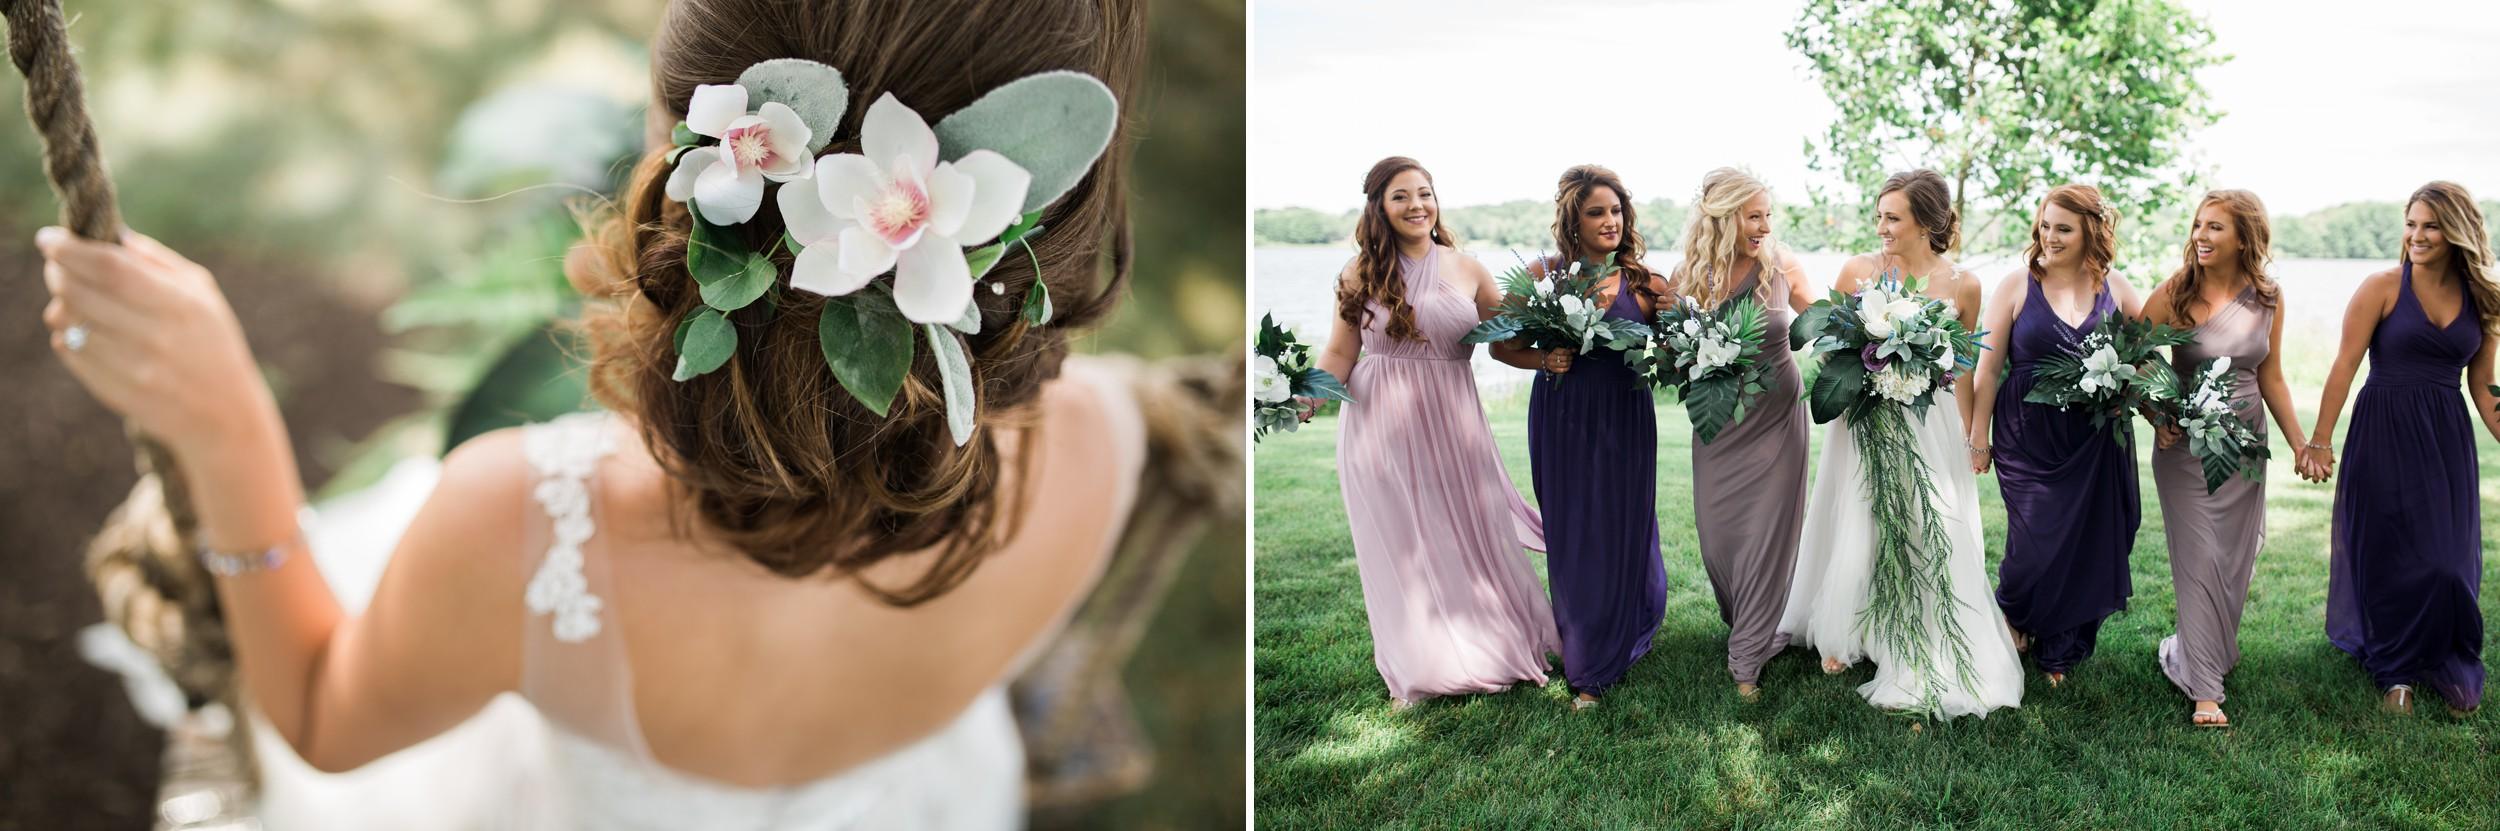 Nick-and-martina-pinelake-vinyards-wedding-columbiana-ohio-tracylynn-photography 32.jpg